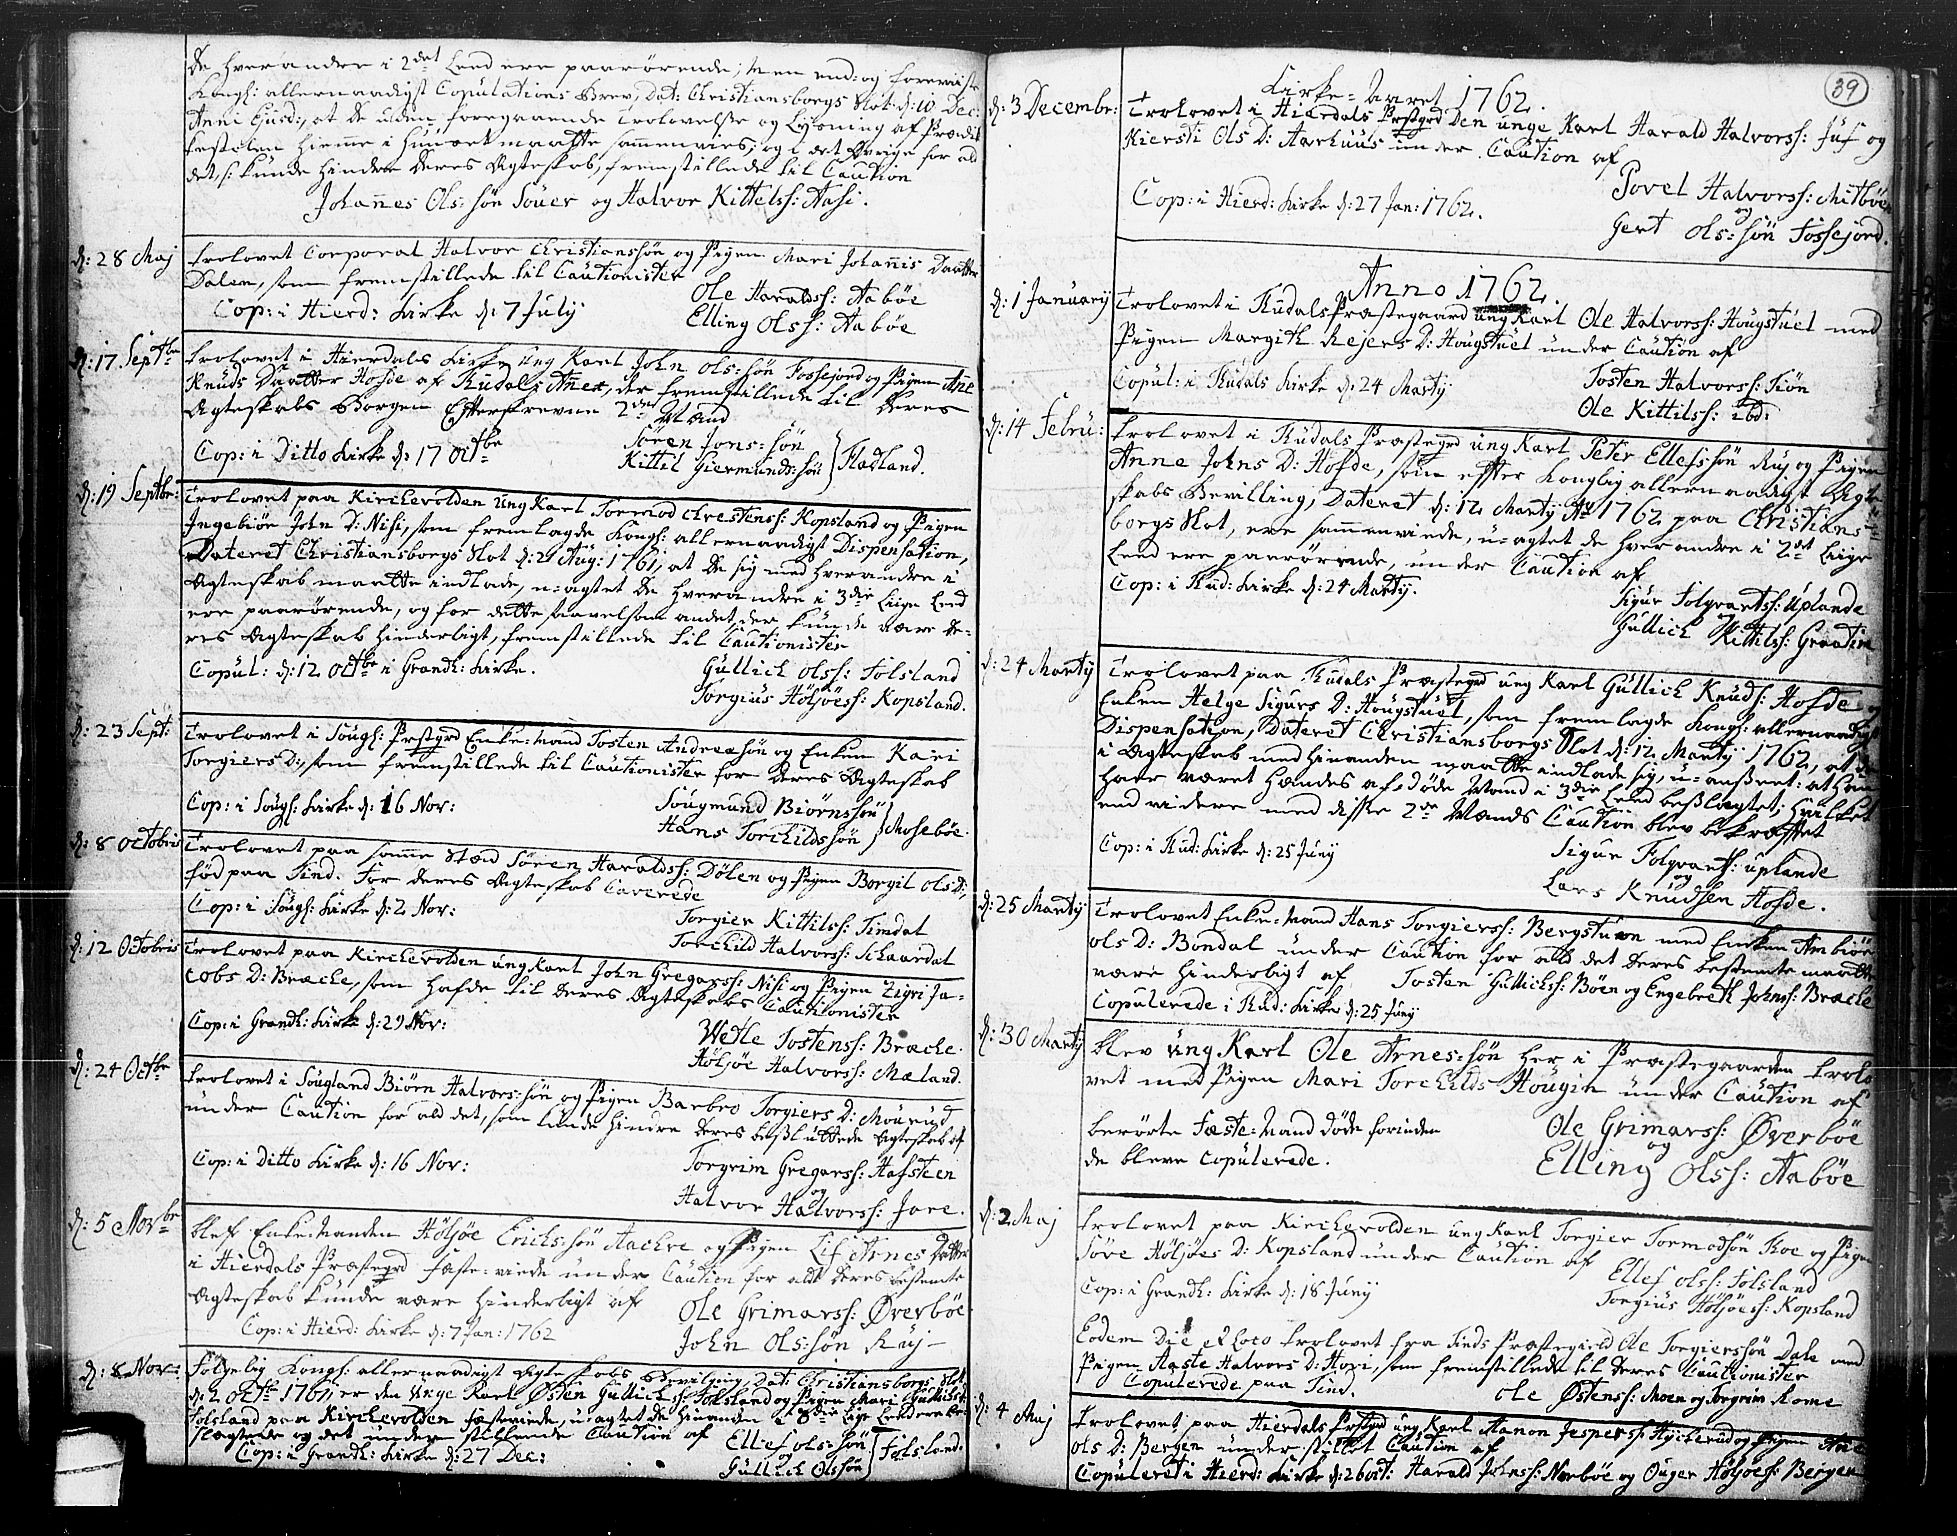 SAKO, Hjartdal kirkebøker, F/Fa/L0004: Ministerialbok nr. I 4, 1727-1795, s. 39